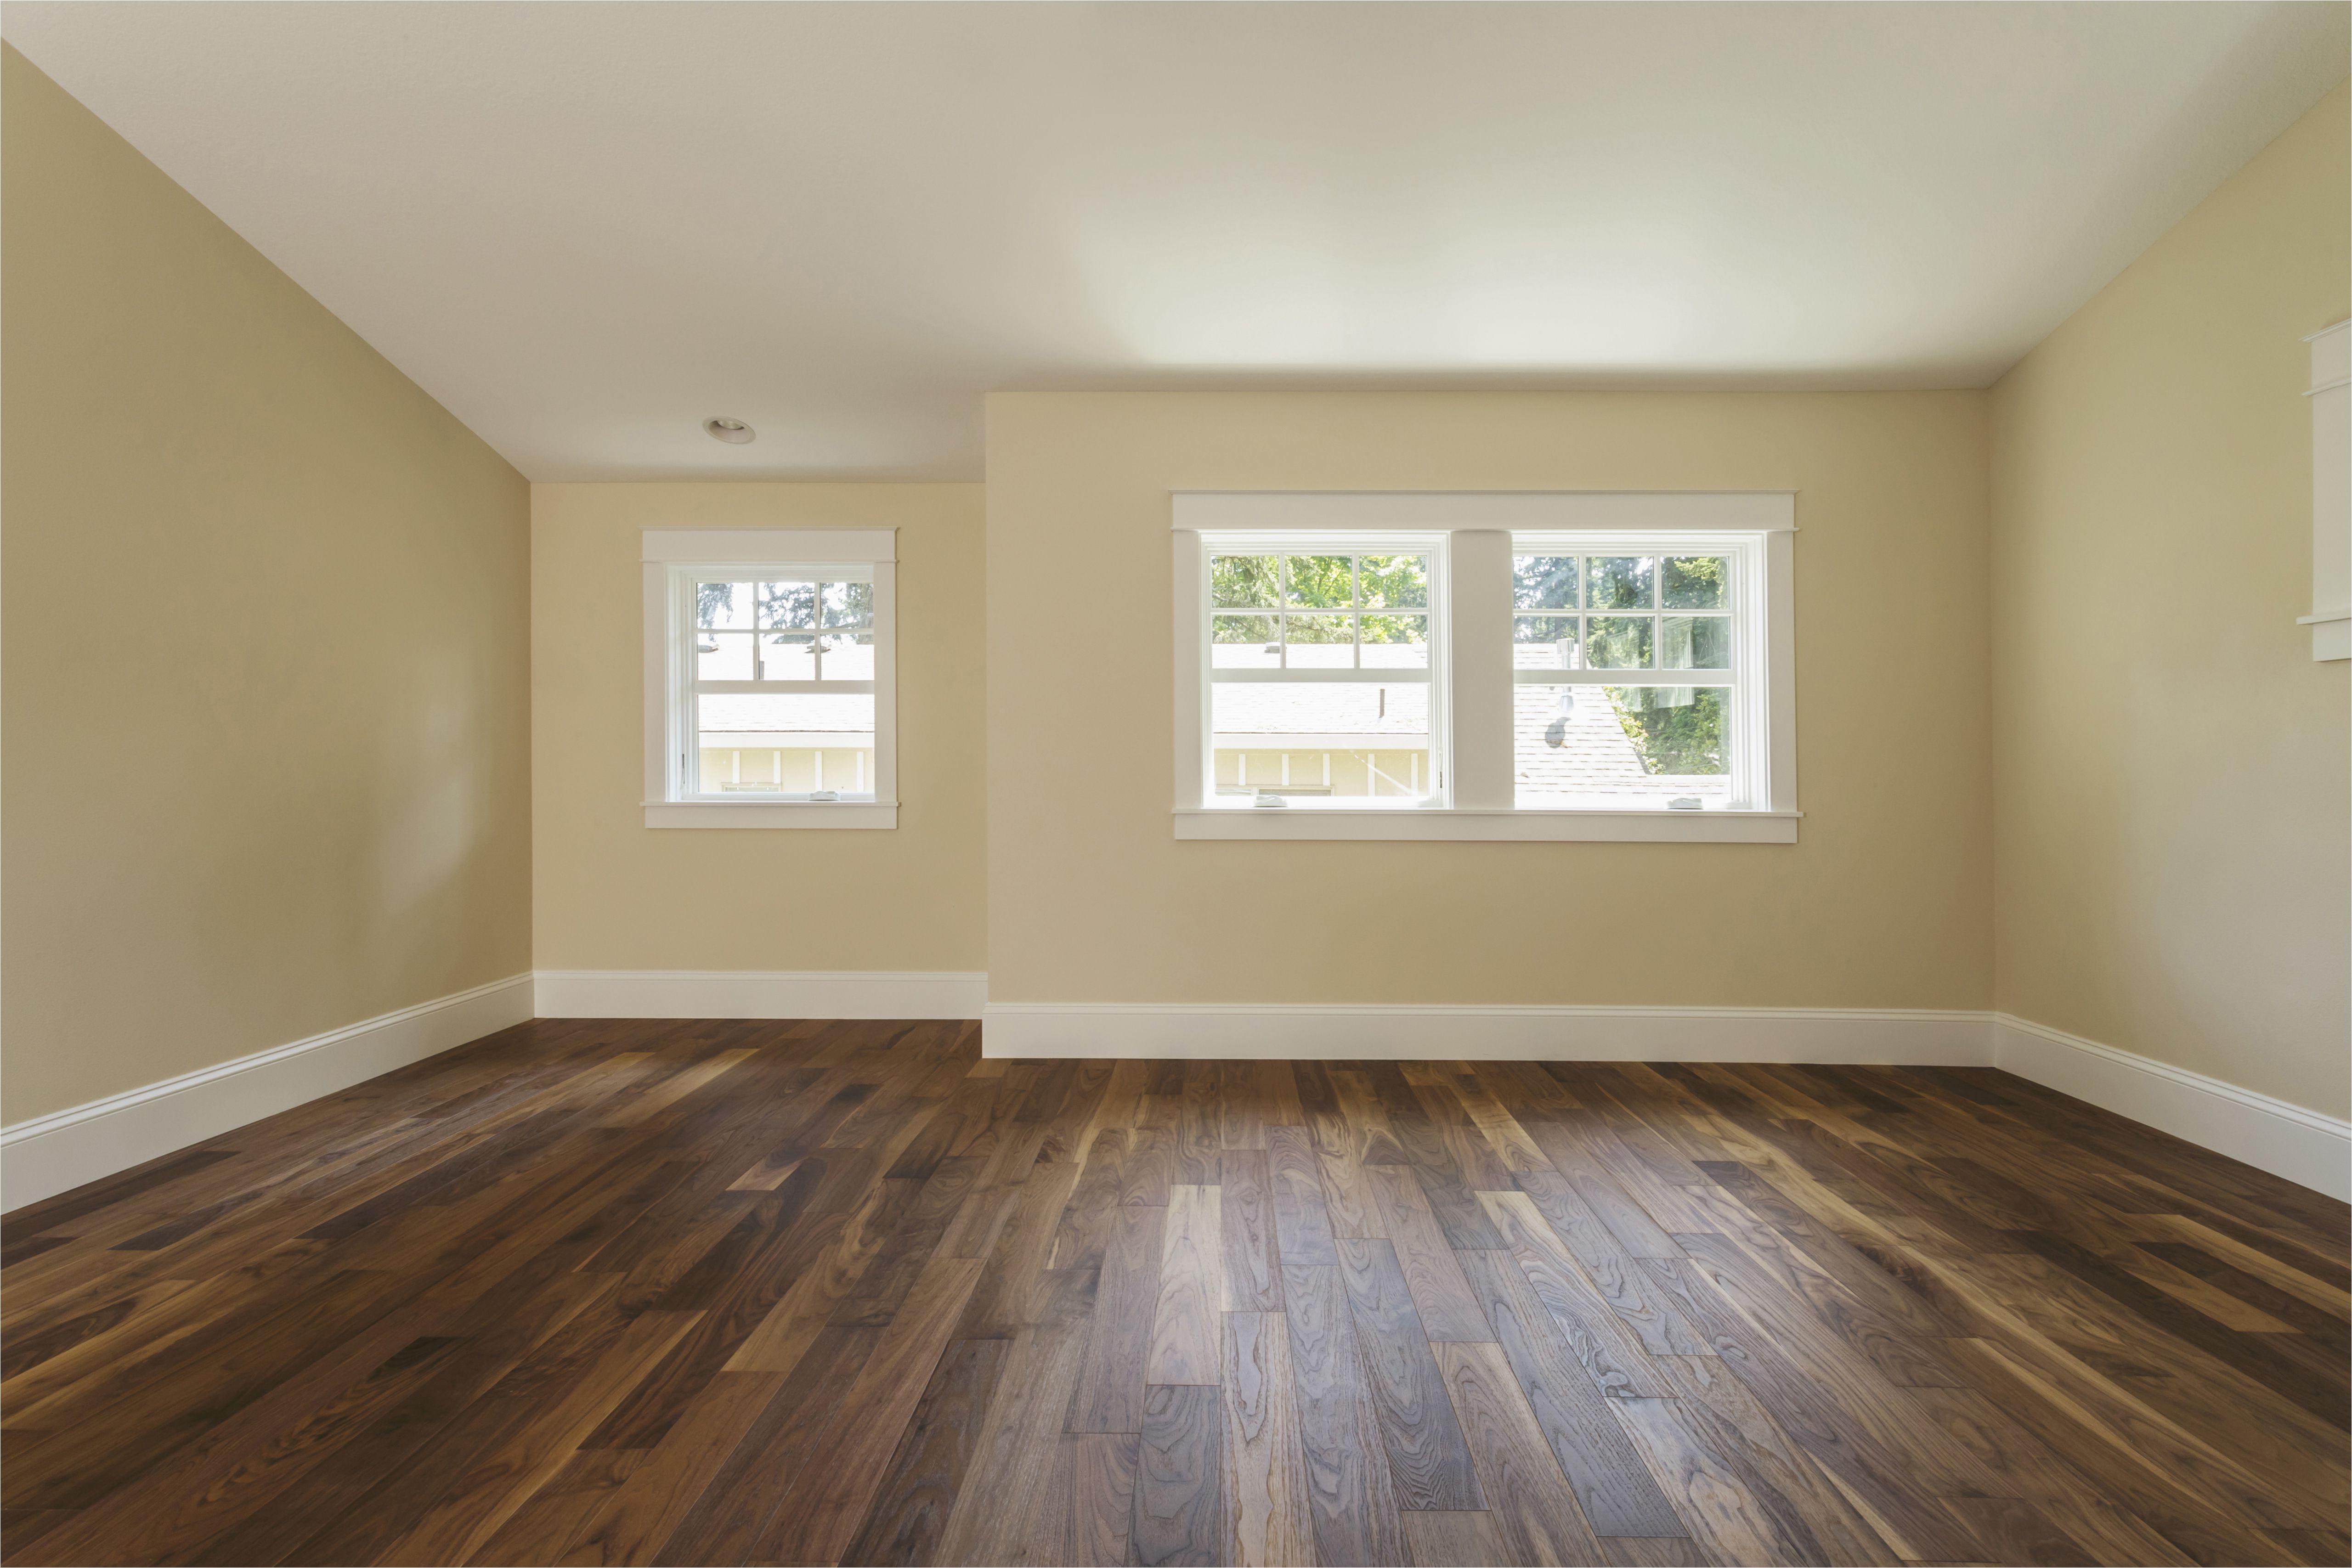 wooden floor in empty bedroom 482143001 588bd5f45f9b5874eebd56e9 jpg